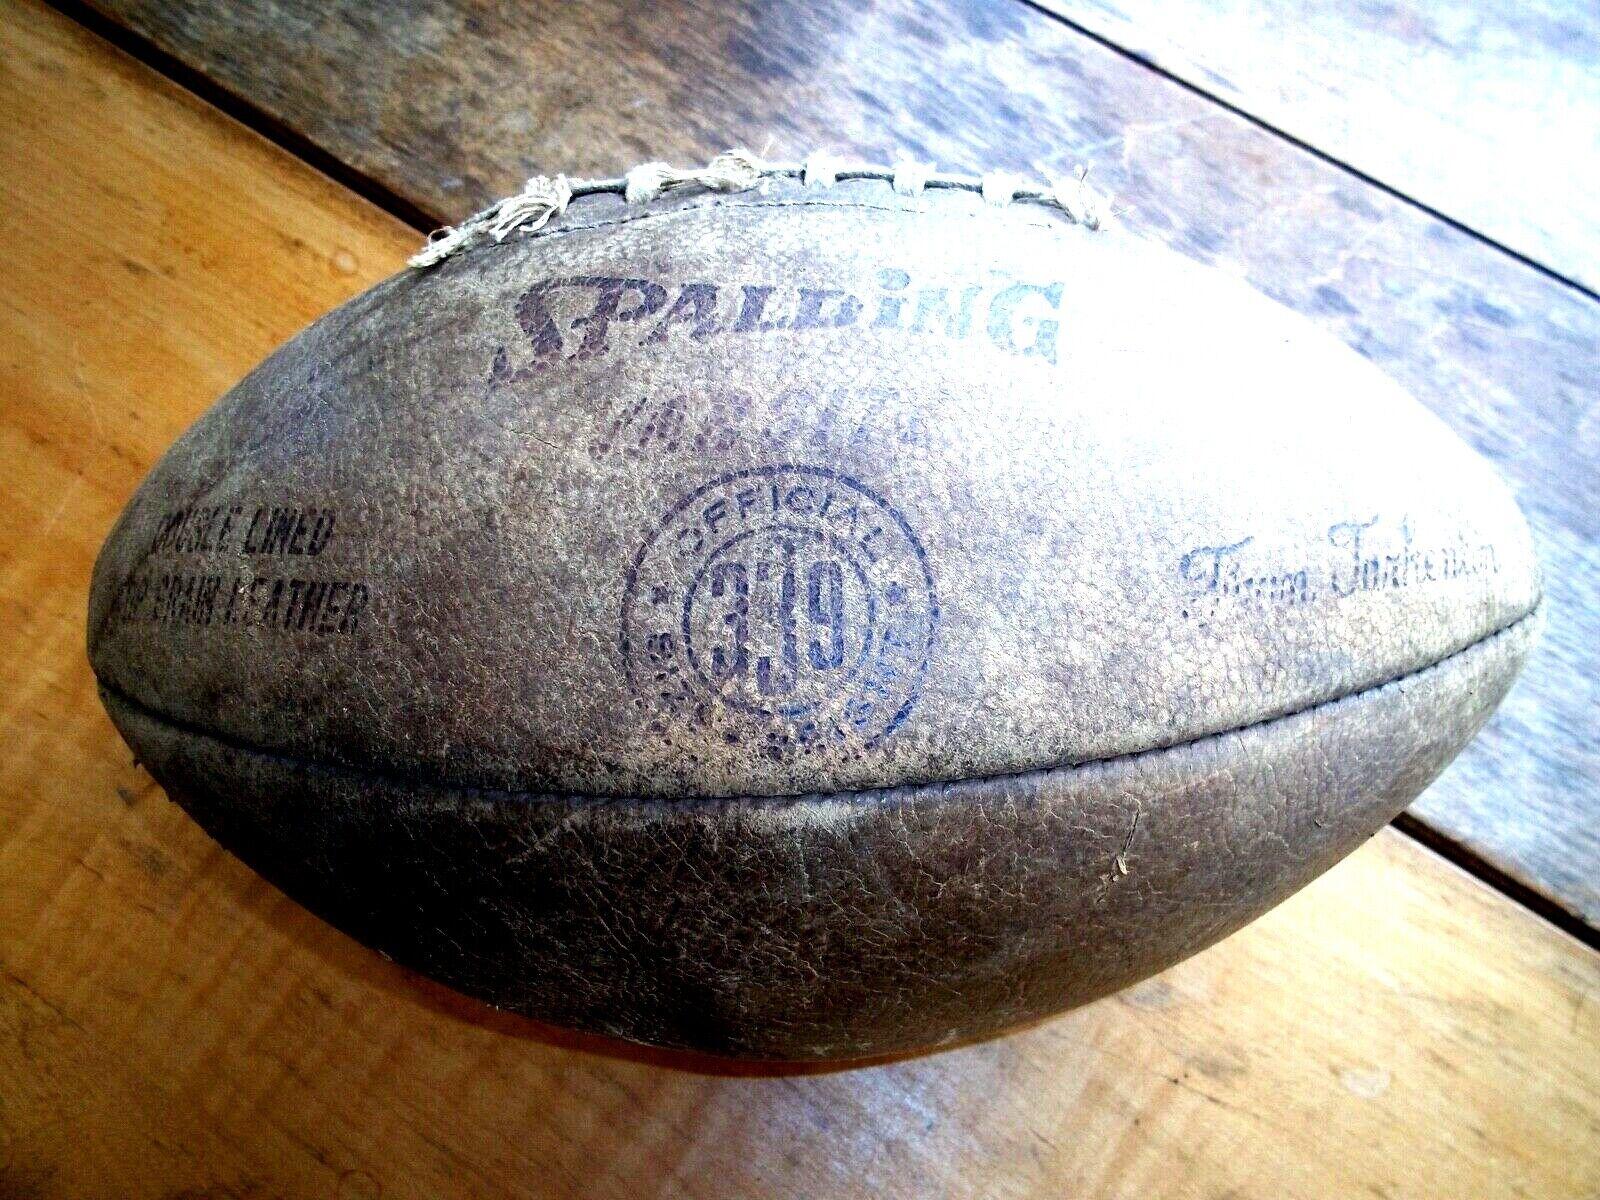 VNTG 60's Spalding Varsity -SEWN Leather Pigskin Football - FRAN TARKENTON